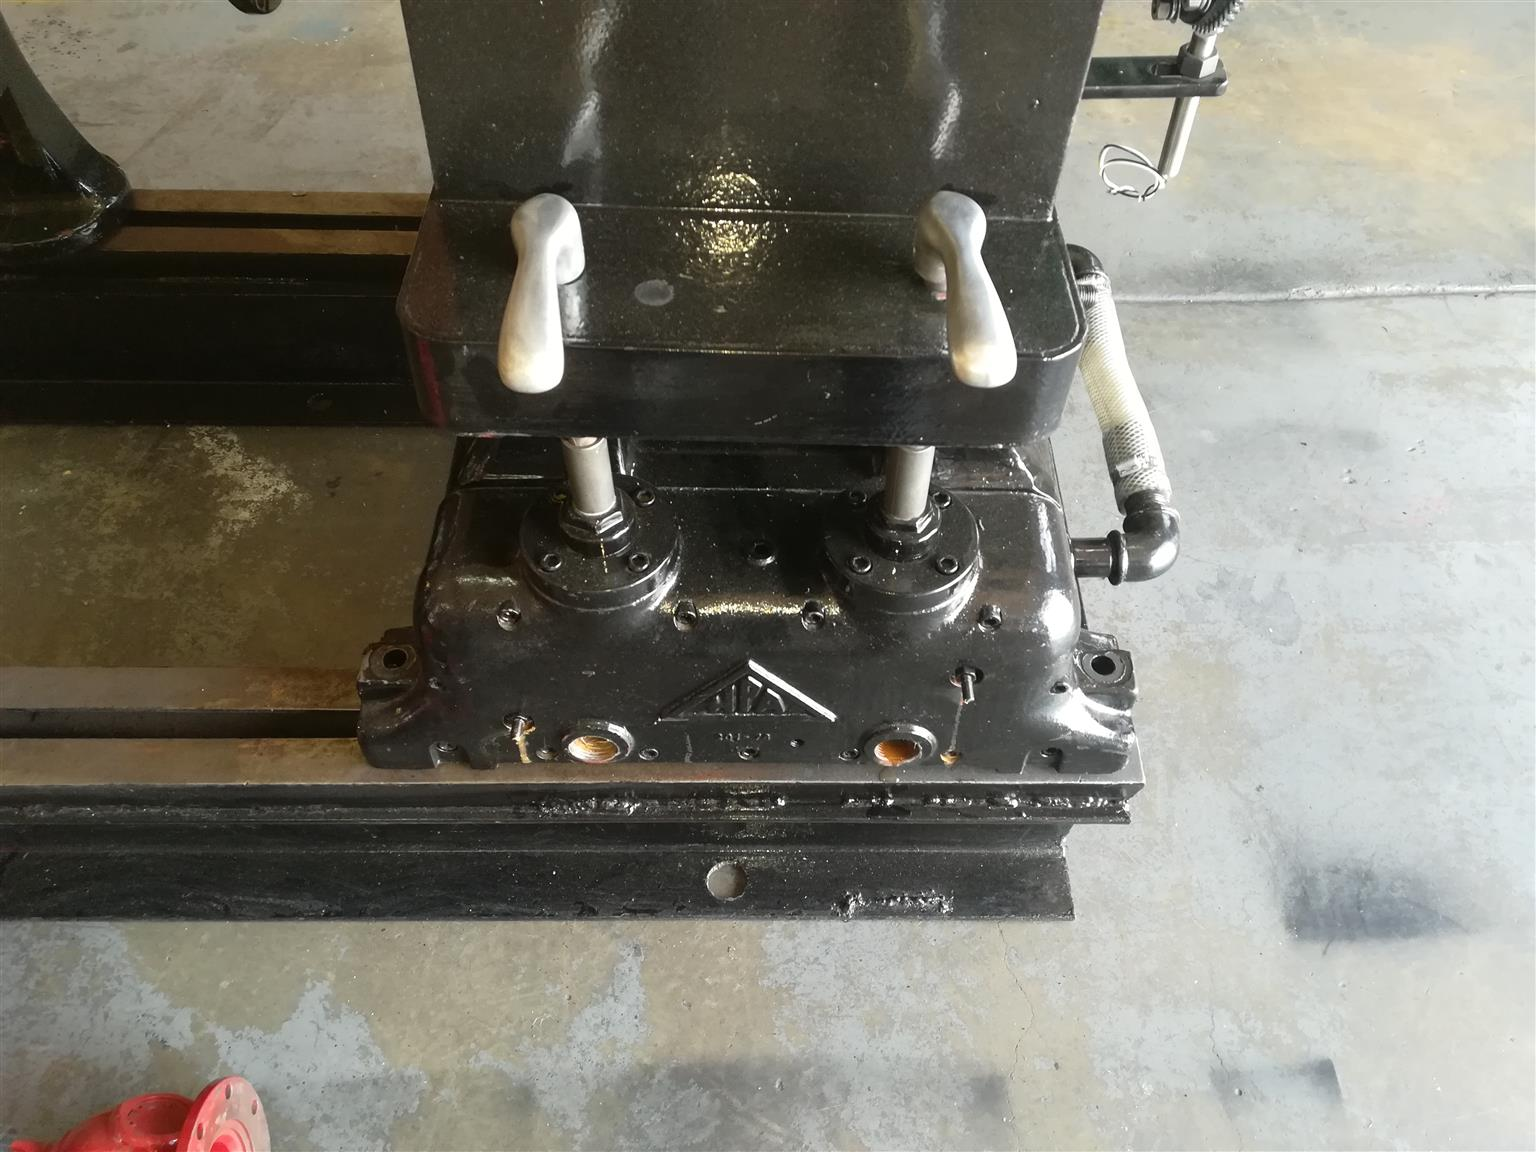 HPA 301 dynamometer